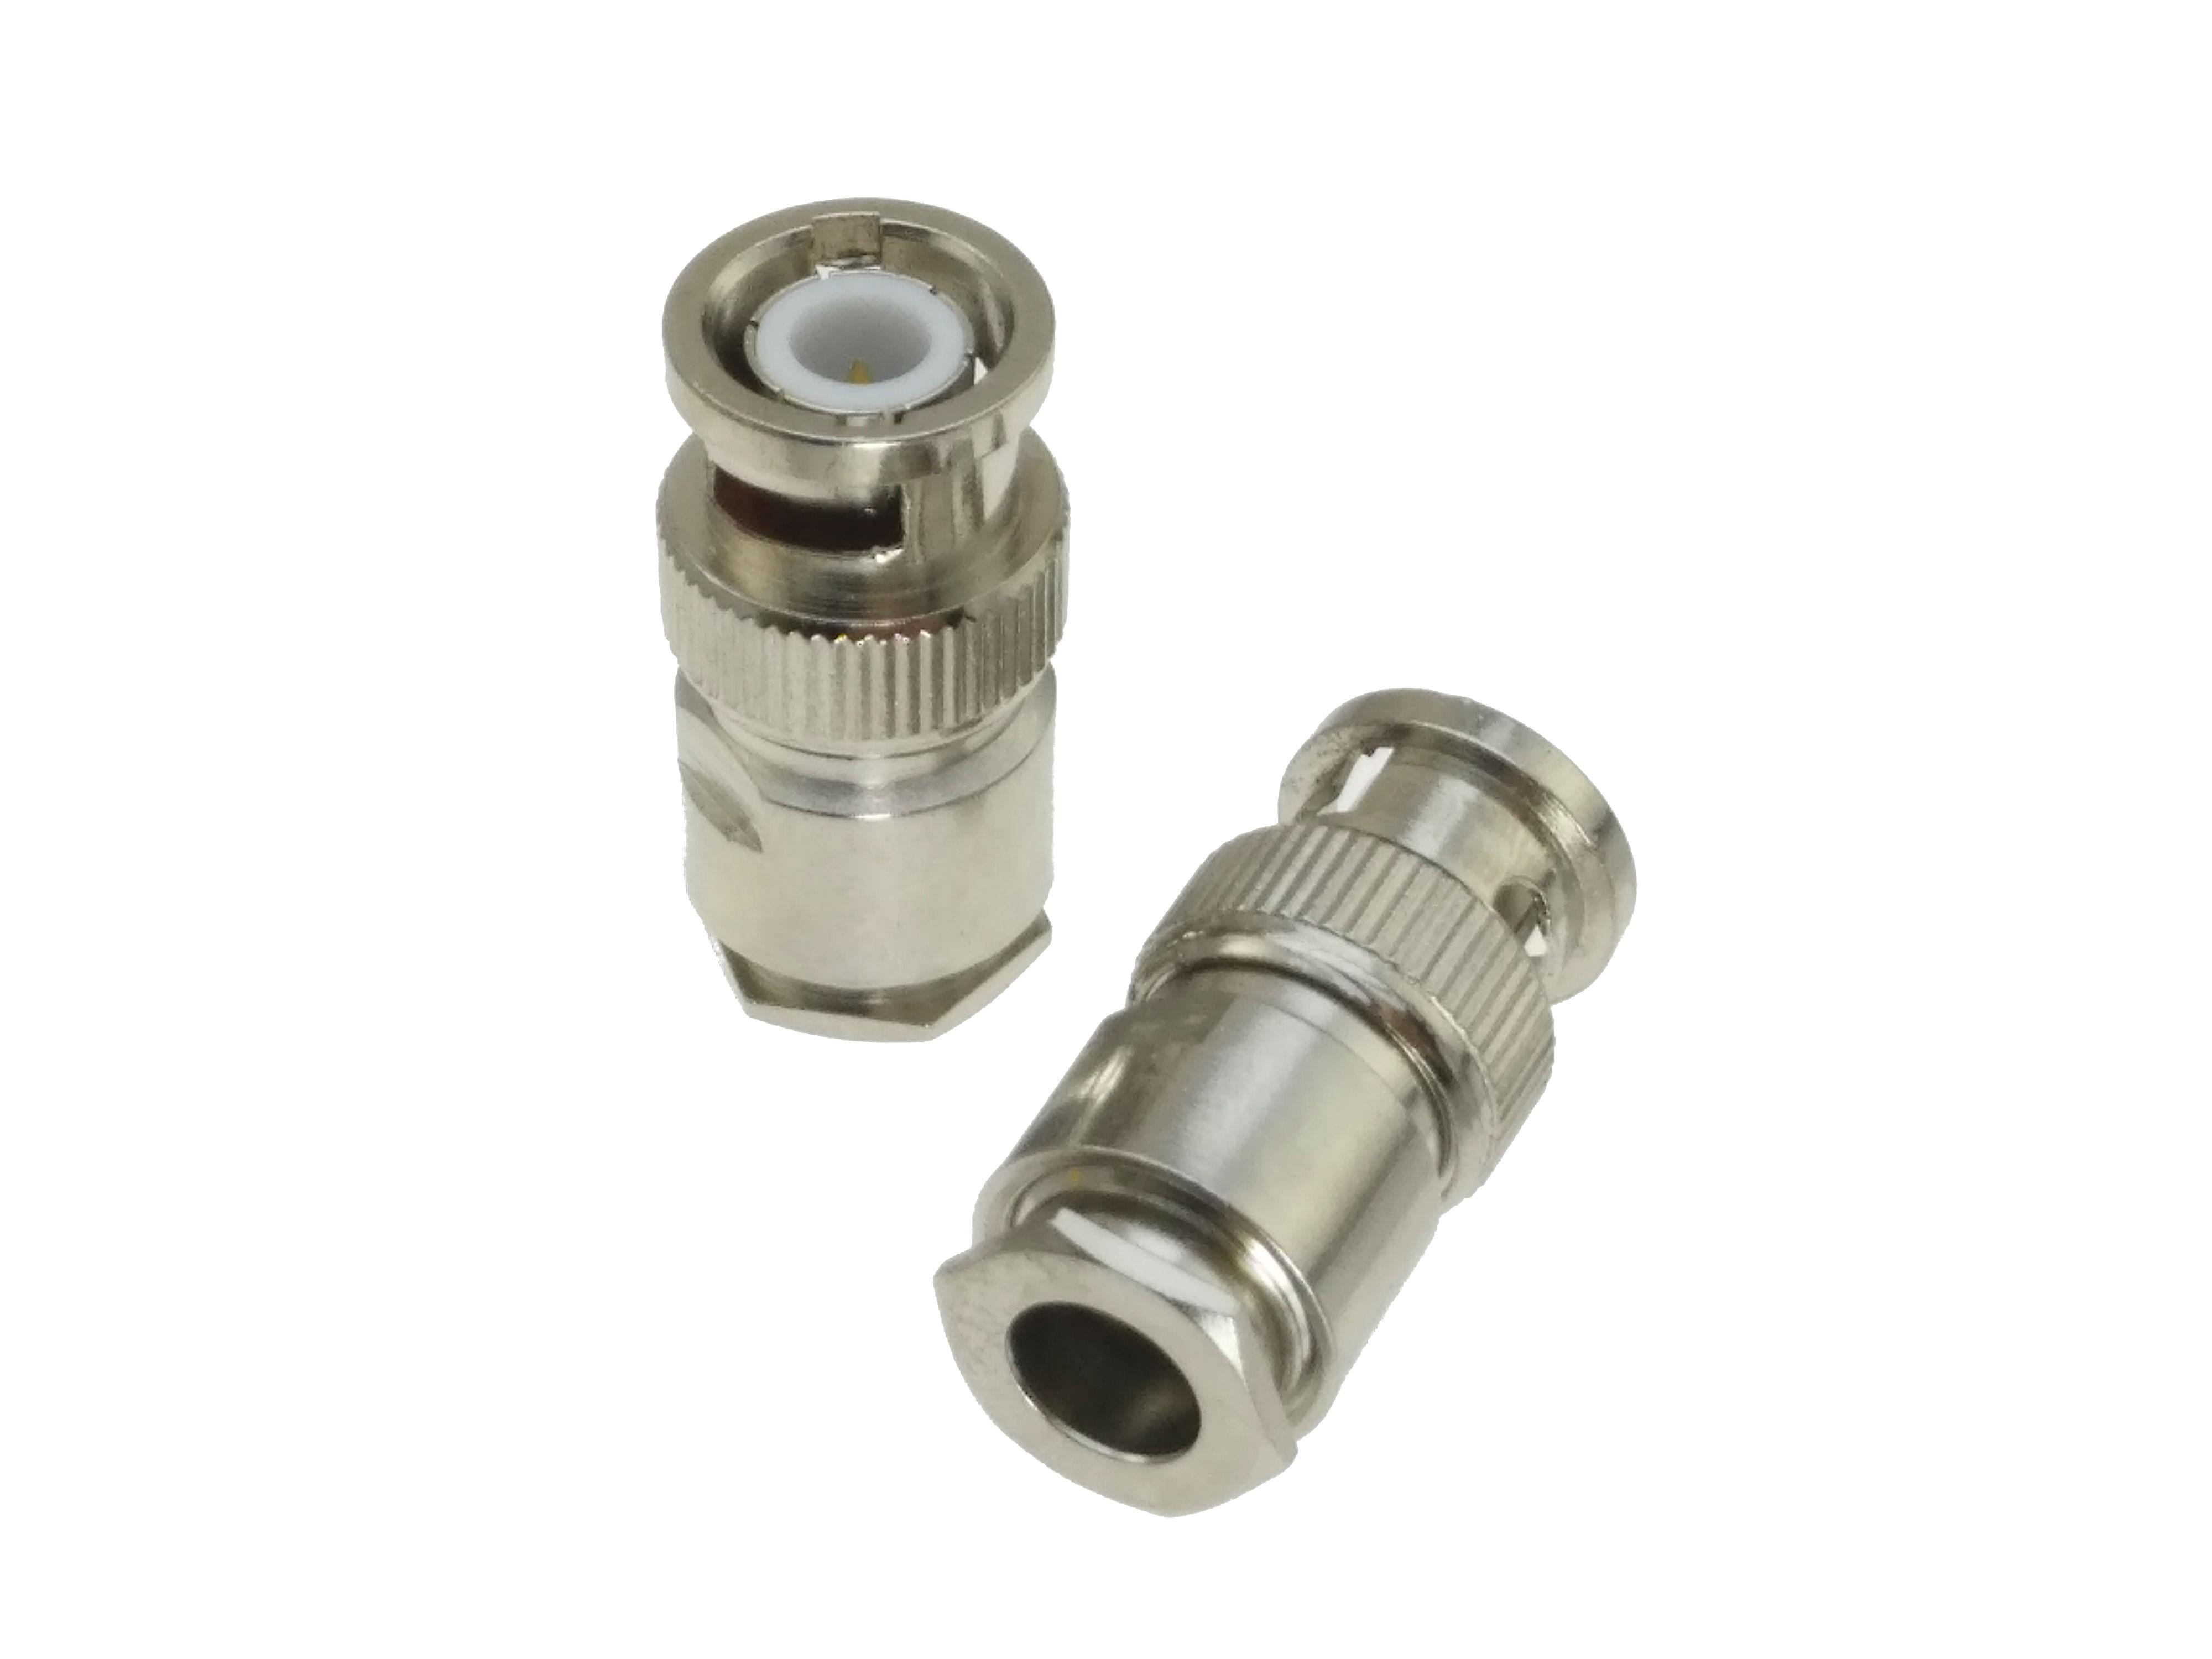 6pcs six color Connector BNC male plug clamp RG59 LMR240 4C-2V RF COAXIAL